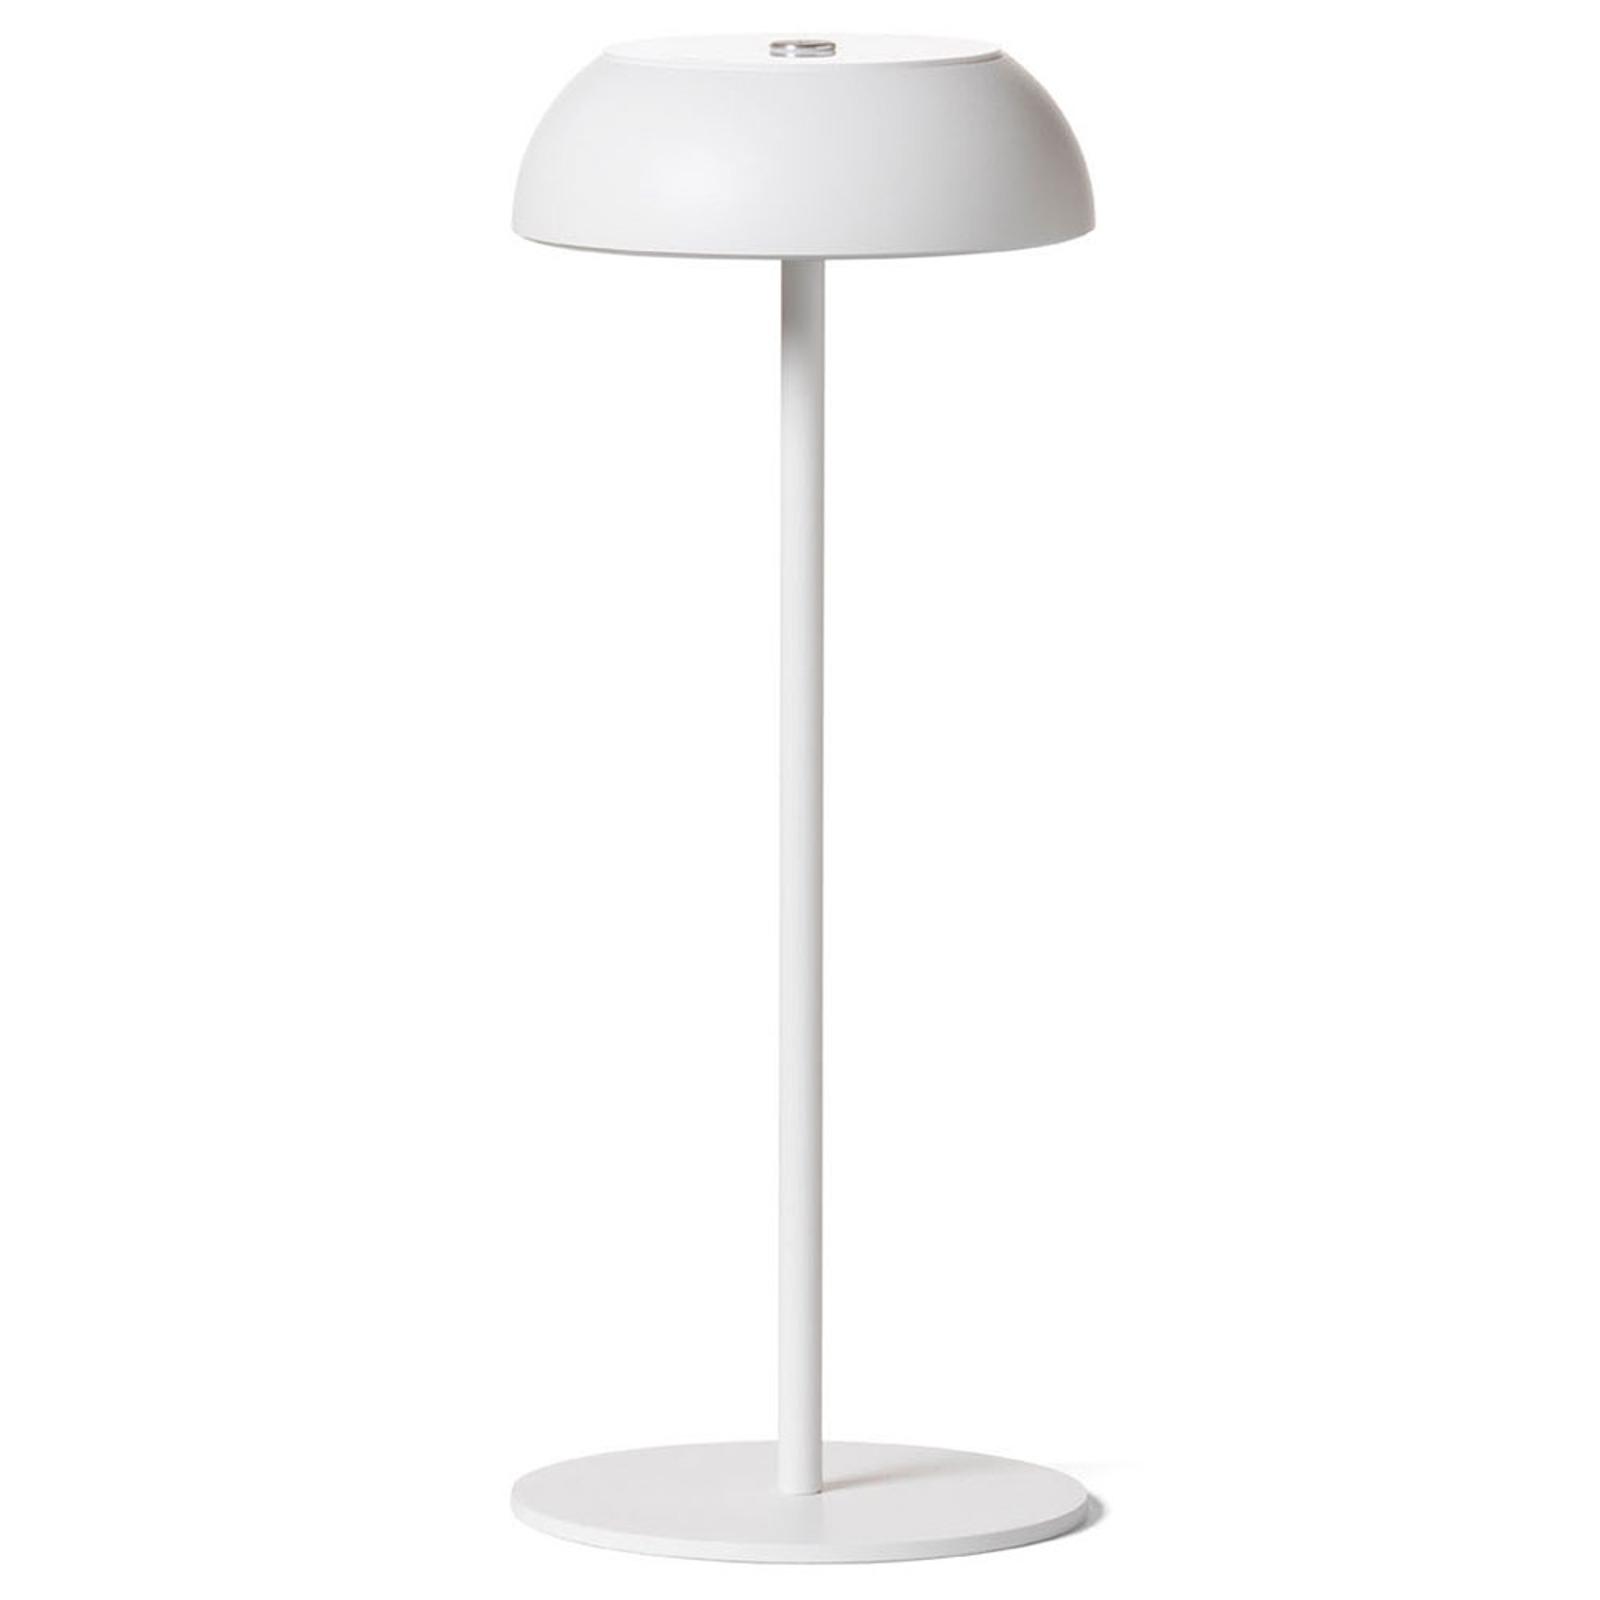 Axolight Float LED-designer-pöytälamppu, valkoinen